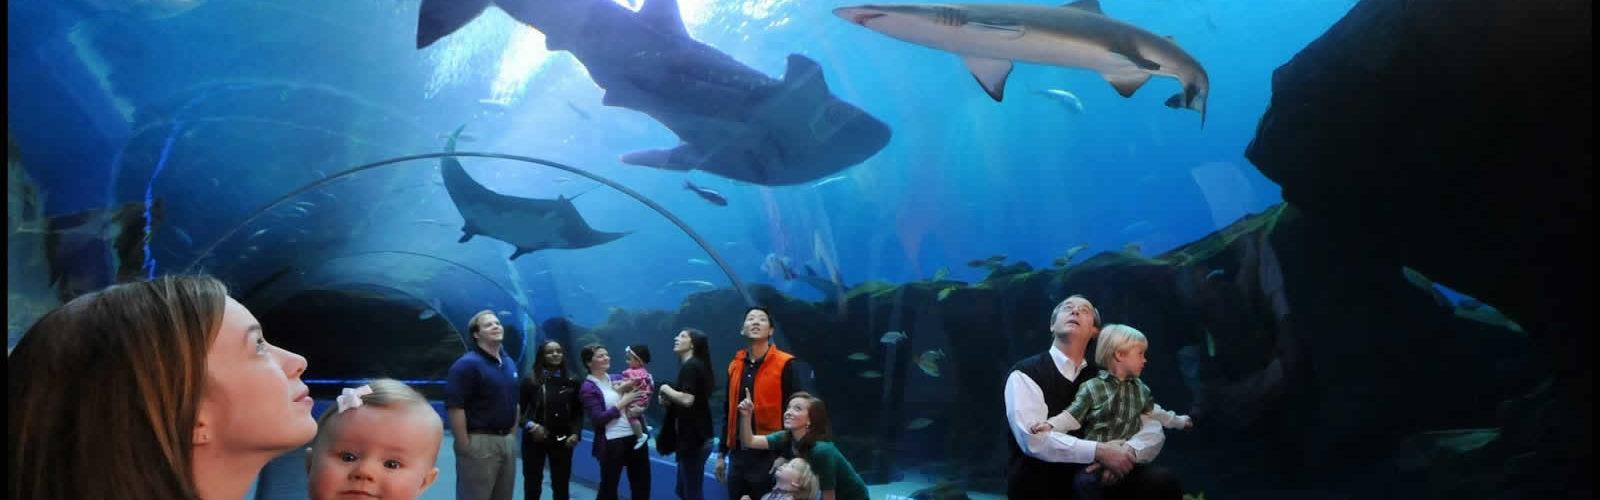 ceetiz-visiter-atlanta-tours-attractions-activites-une